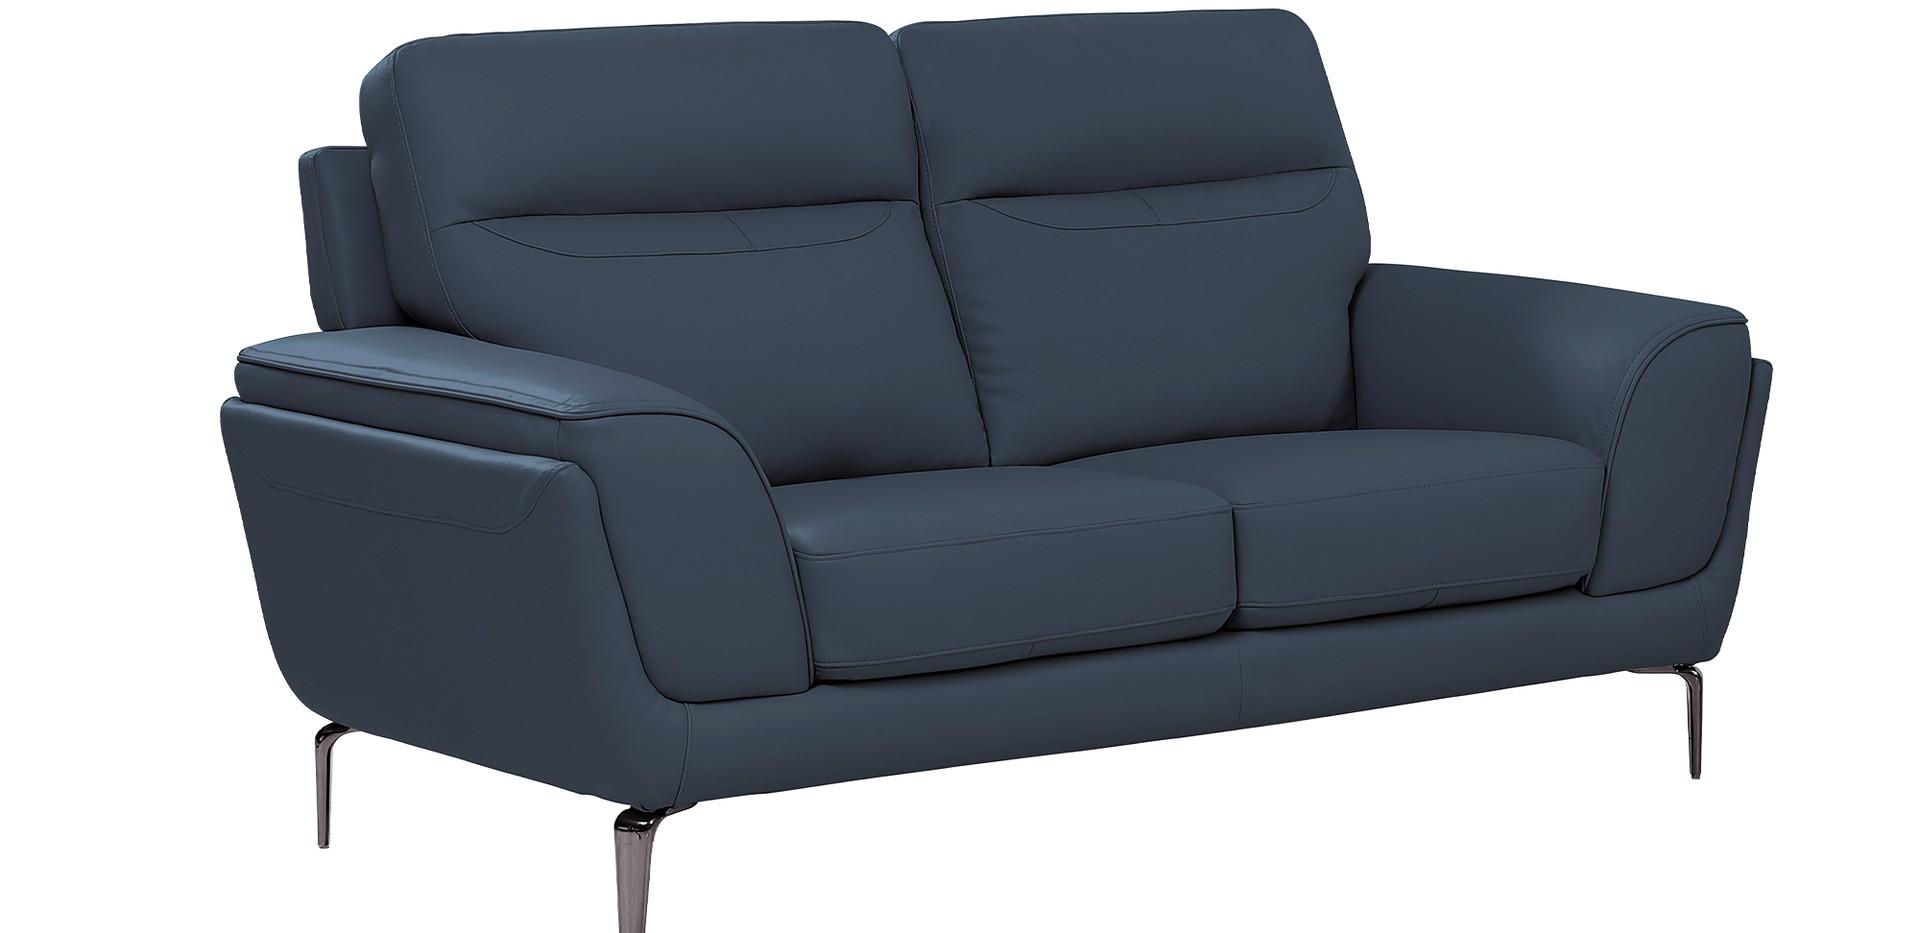 Vitalia 2 Seater -Indigo Blue Angle.jpg